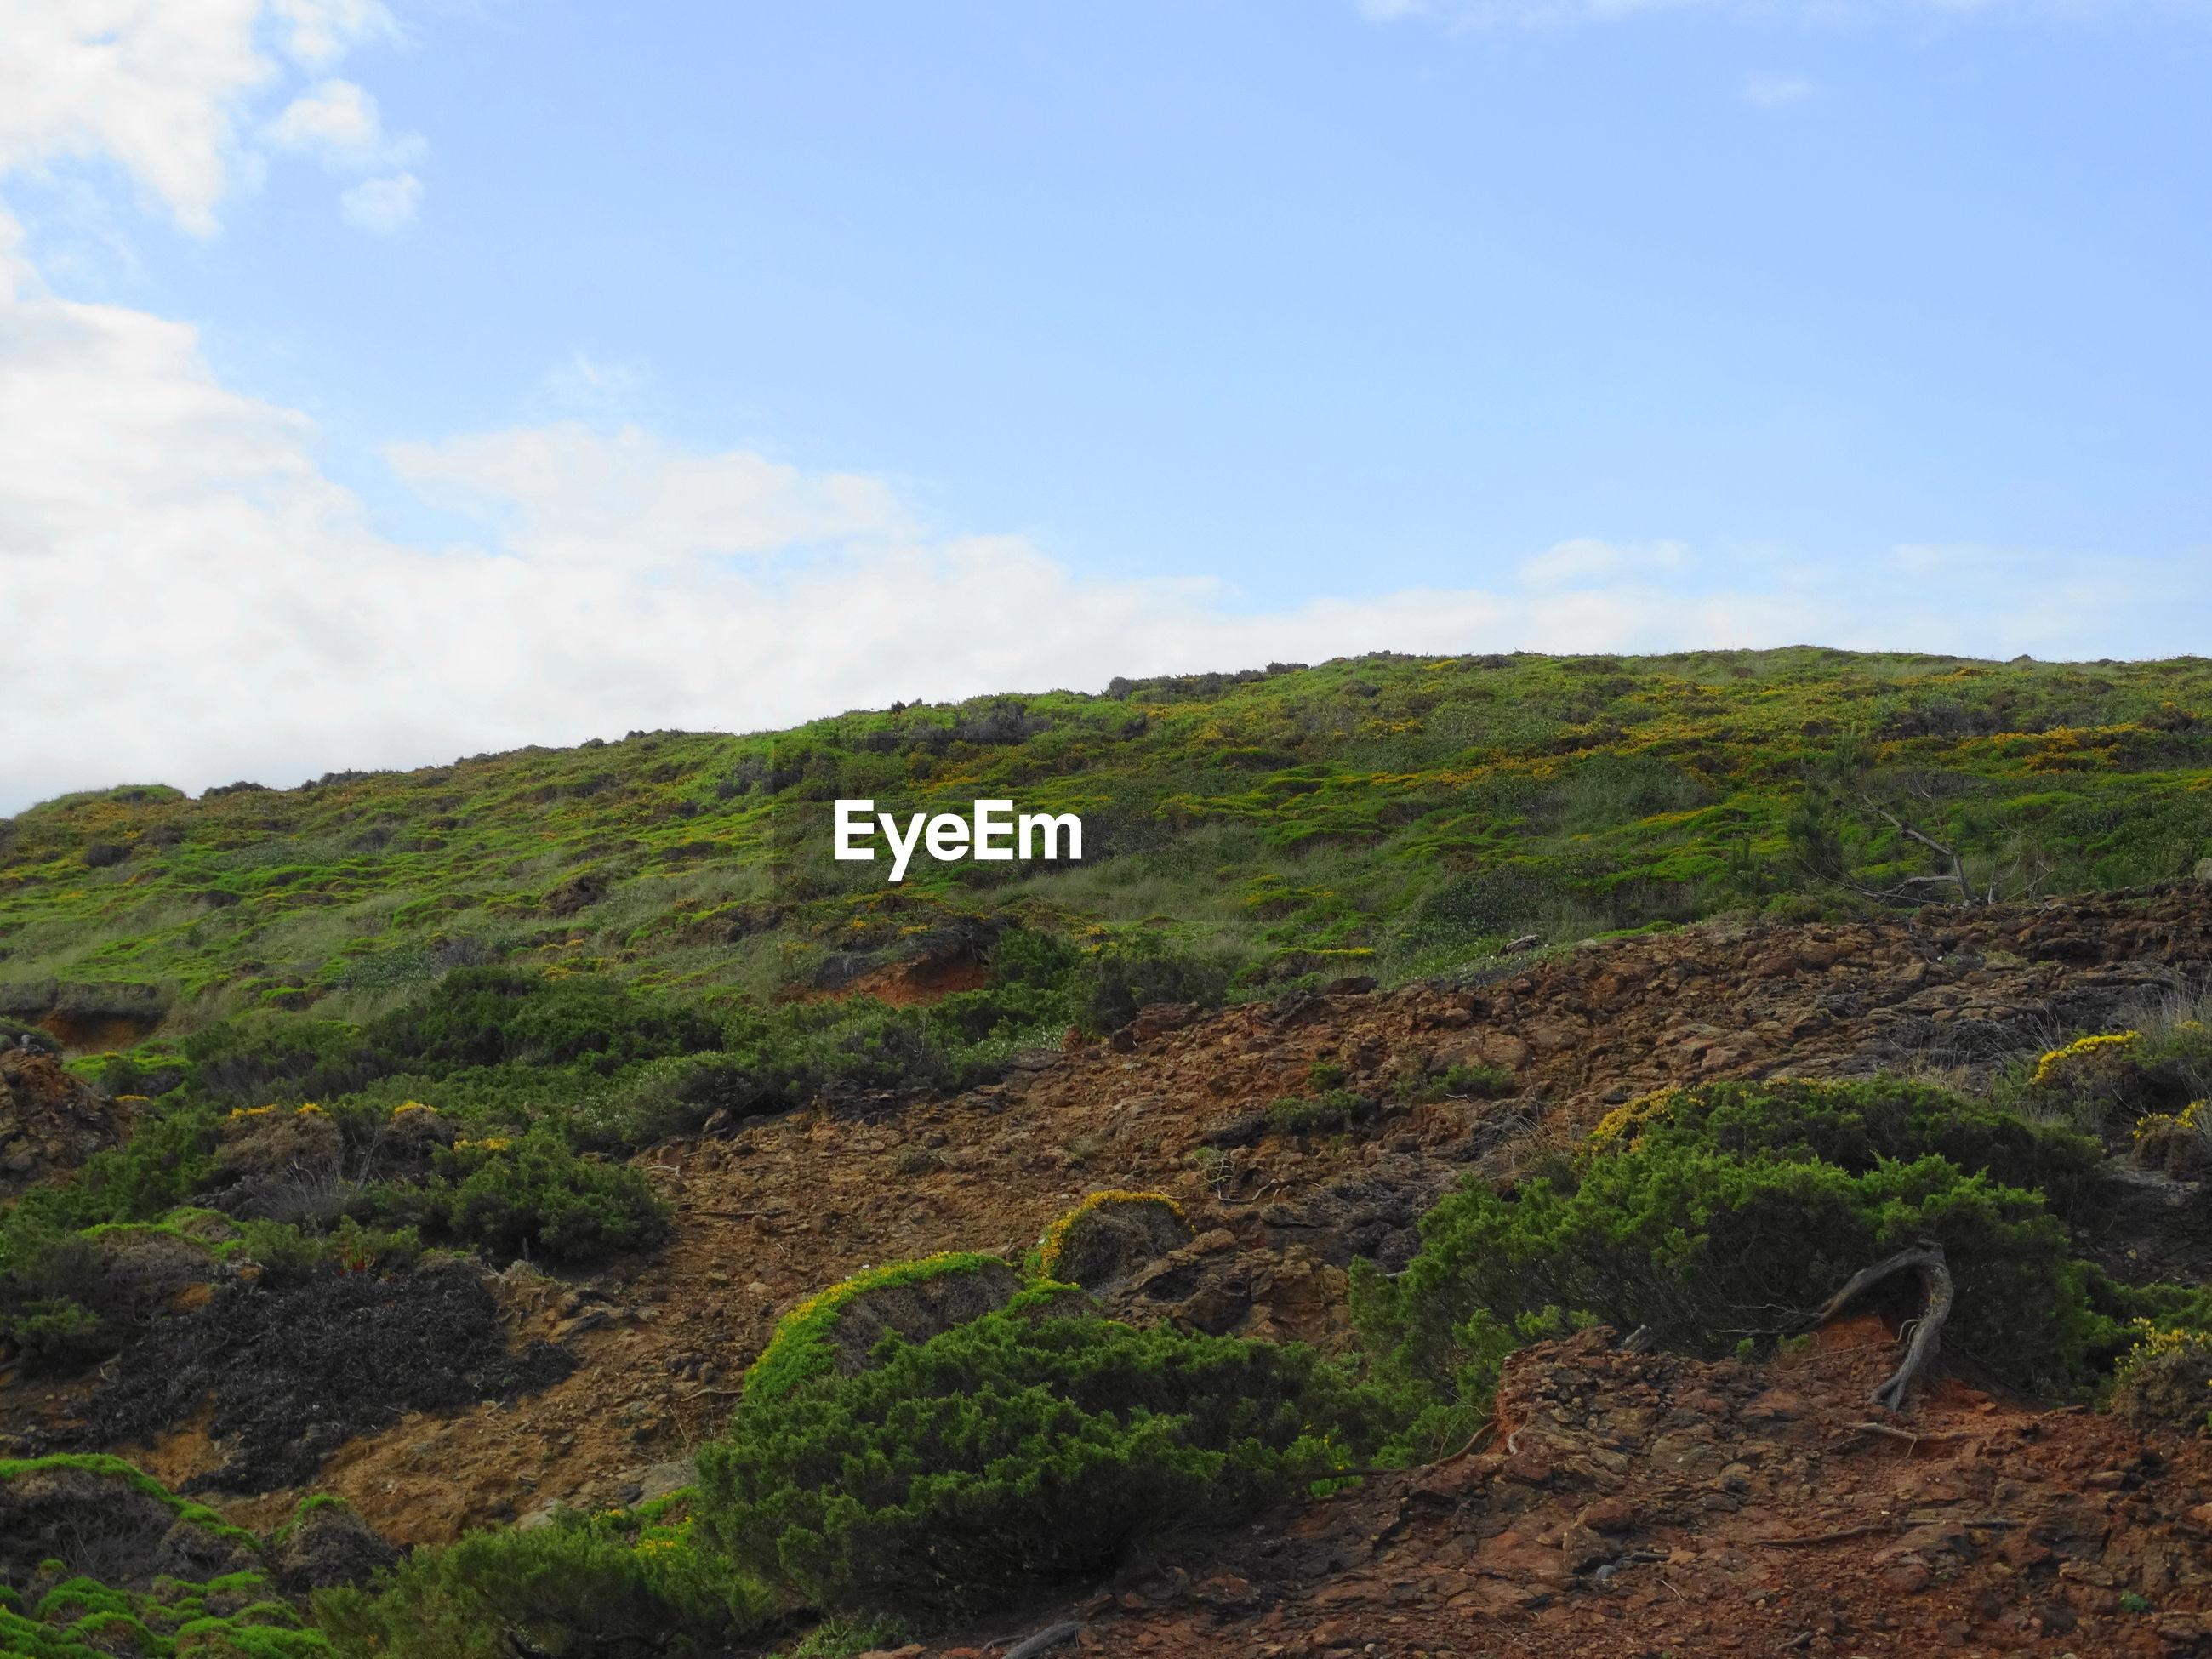 GREEN LANDSCAPE AGAINST SKY